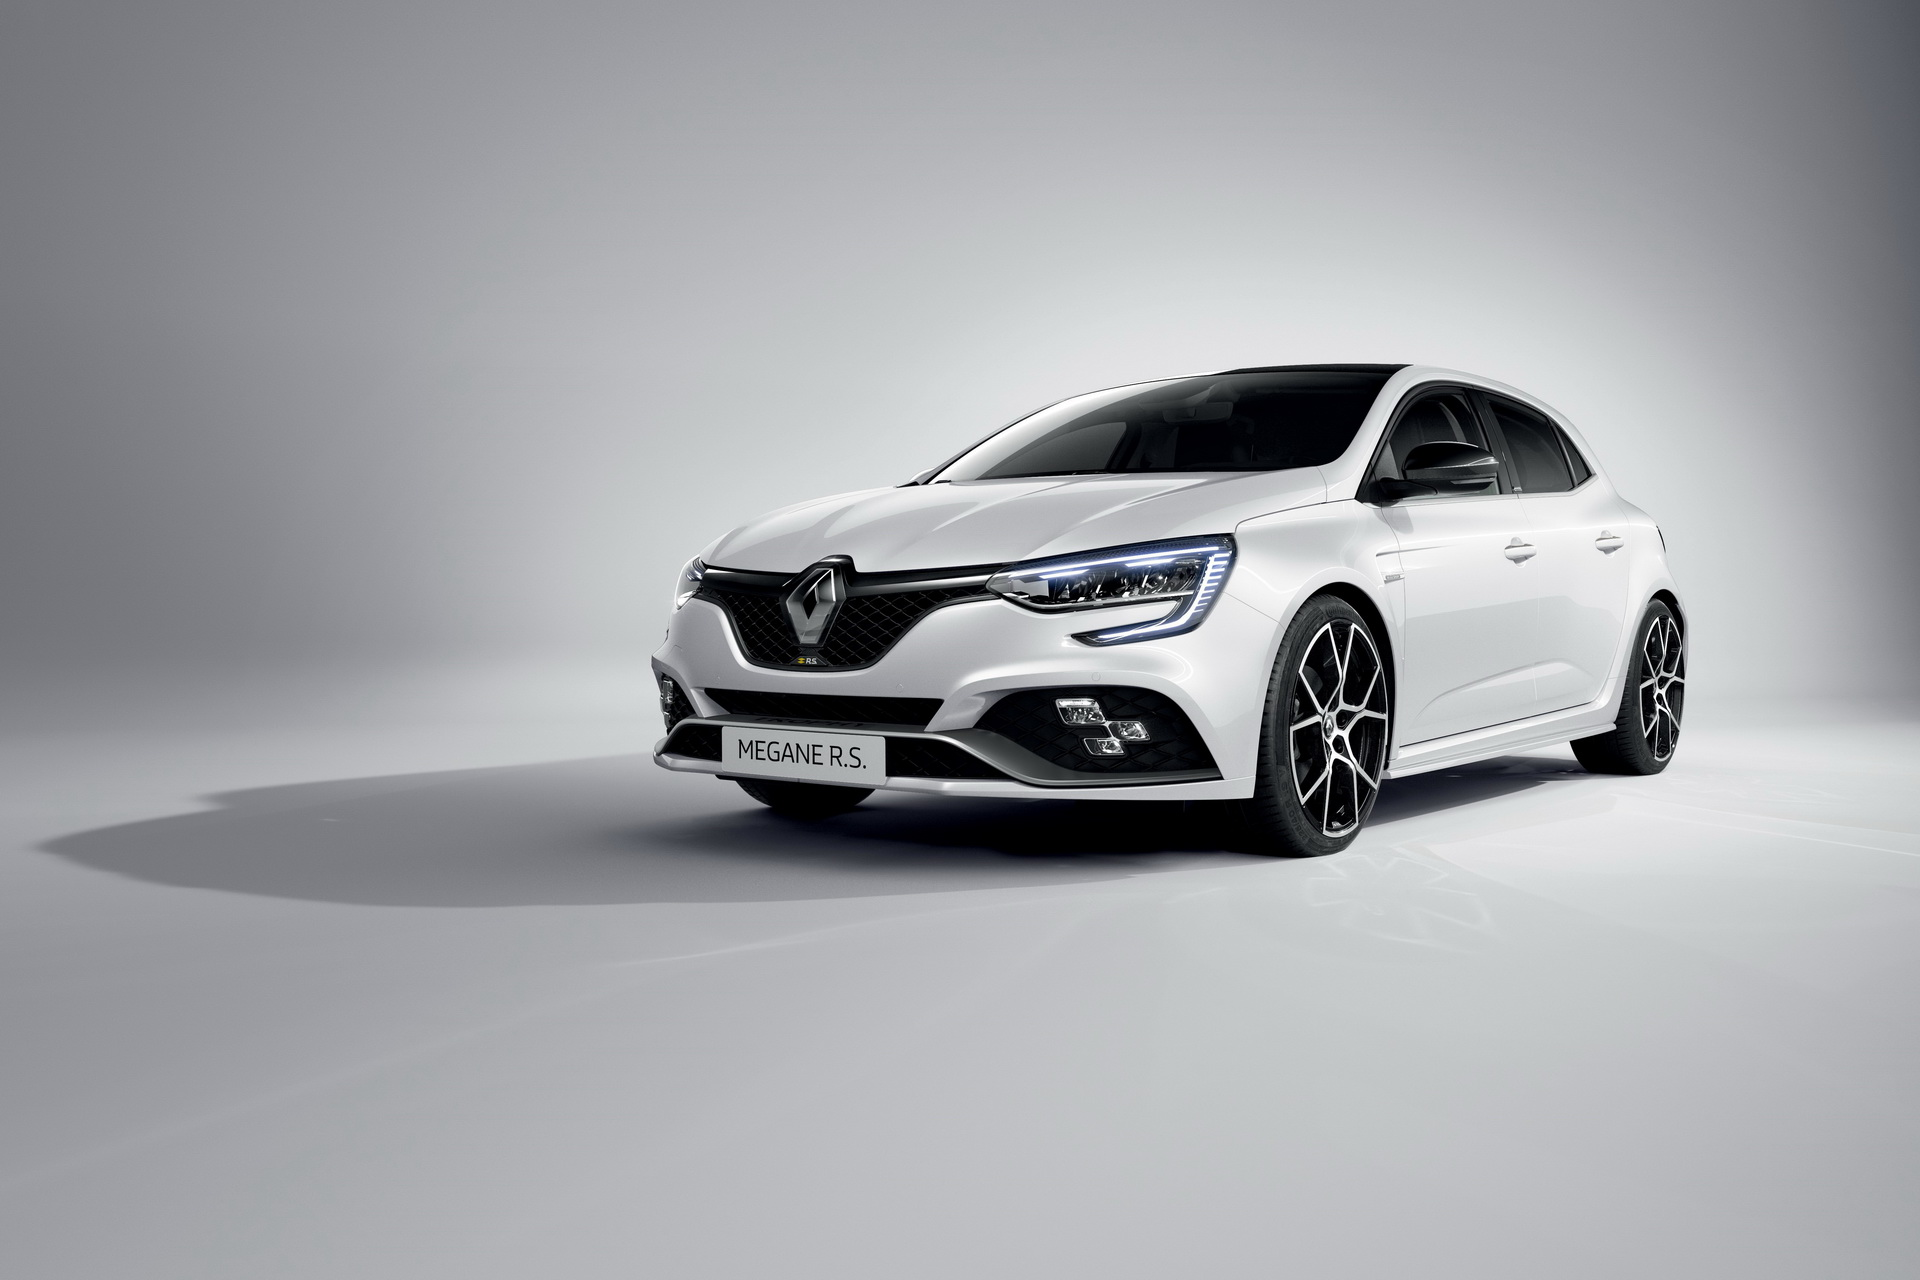 Renault Renova A Gama Megane Auto Drive